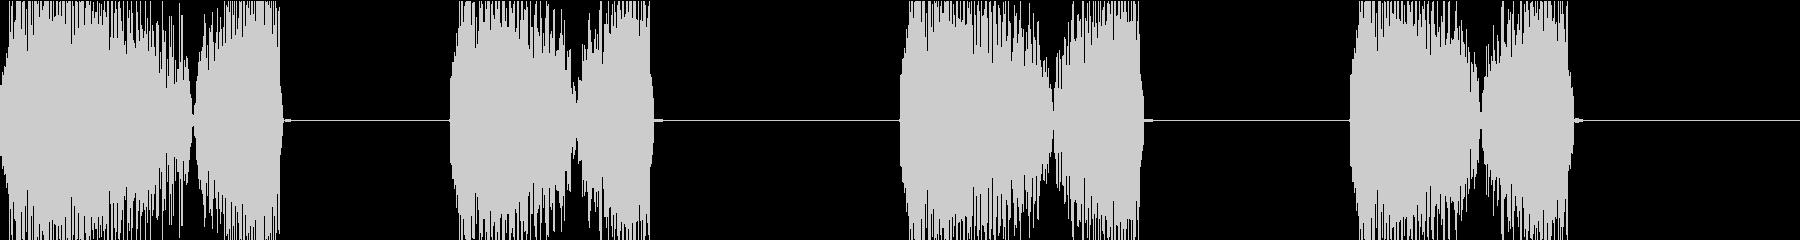 DJプレイ スクラッチ・ノイズ 113の未再生の波形